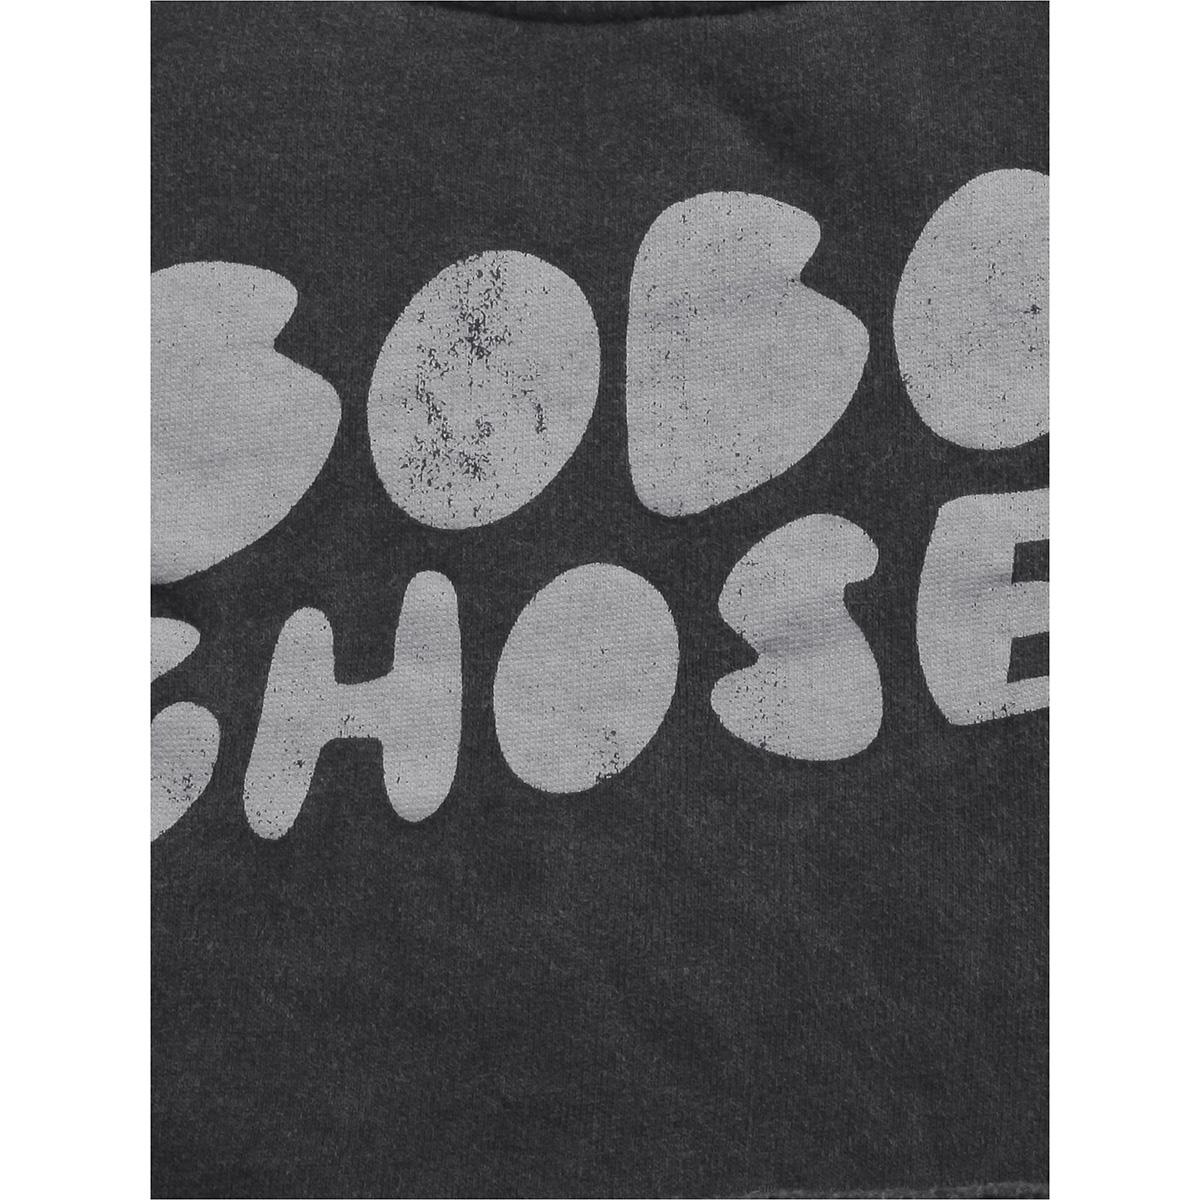 From spain Bobo Choses cropped sweatshirt 100/110/120/130/140-150/150-160 オーガニックコットン100%